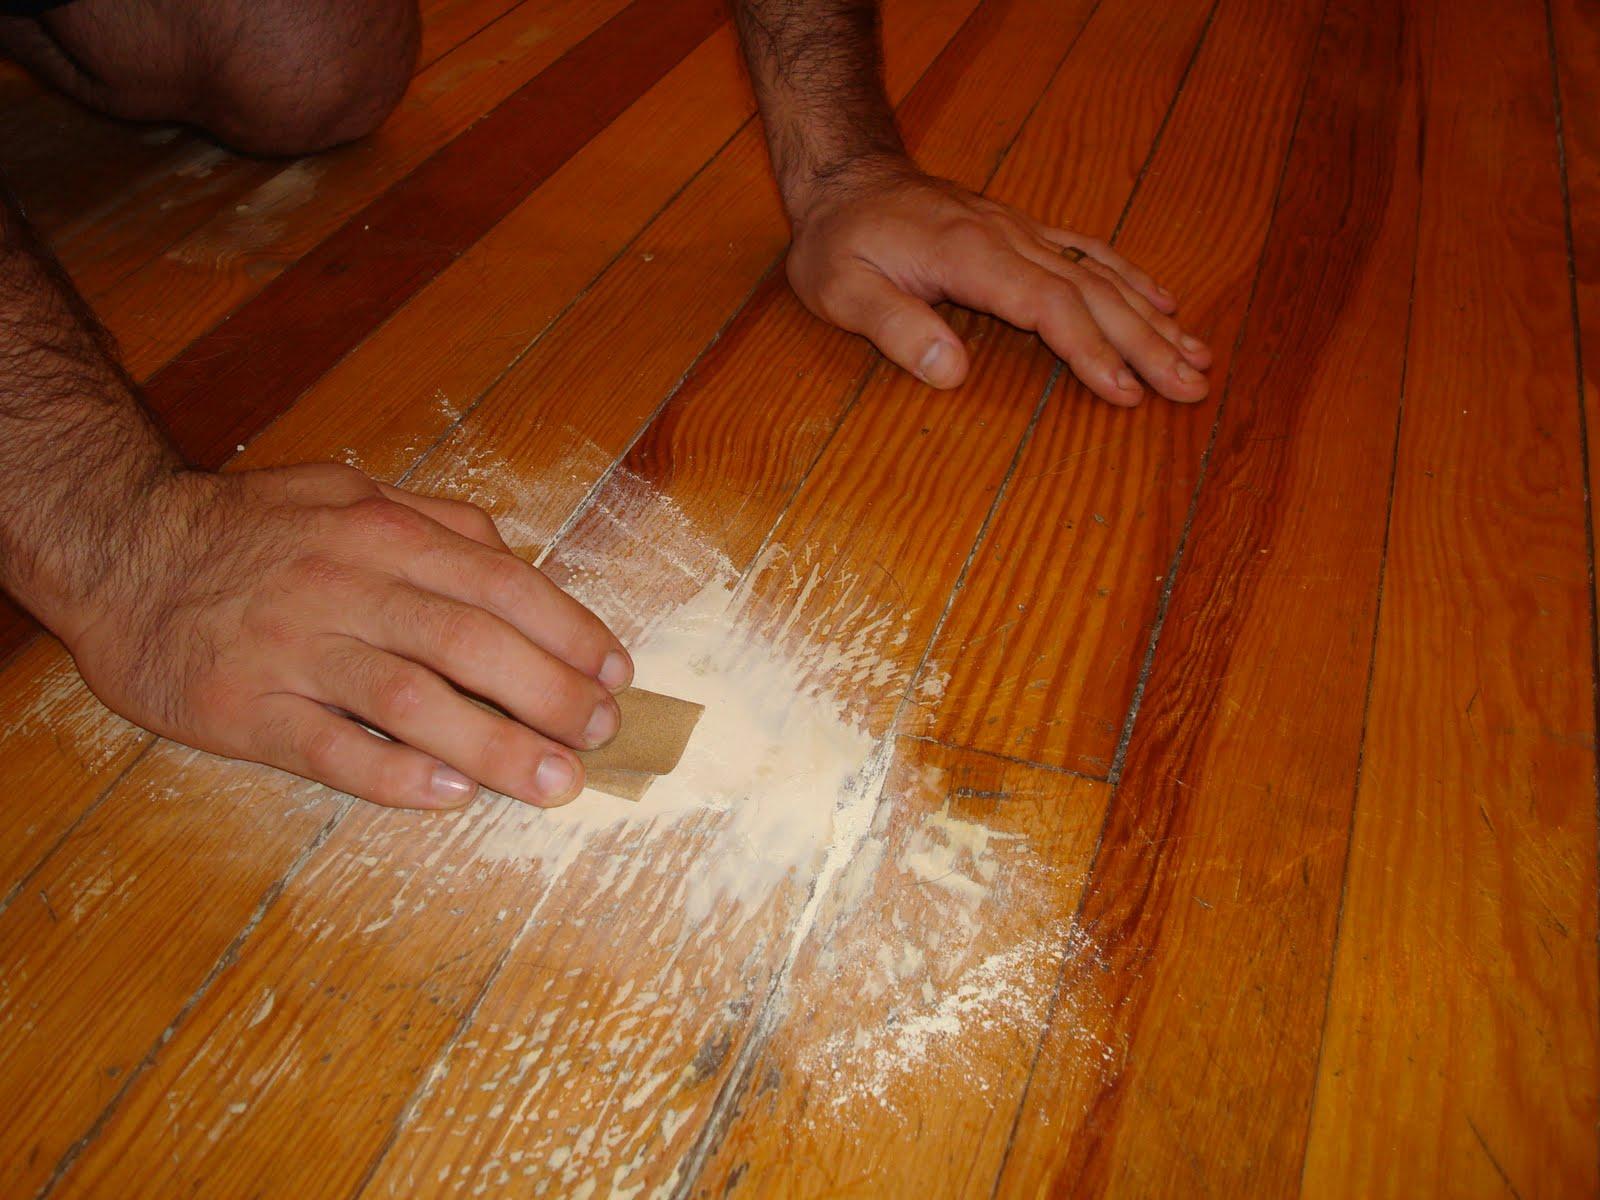 Parquet floor filler flooring ideas and inspiration diy painted kitchen floor for 50 effortless style blog solutioingenieria Gallery